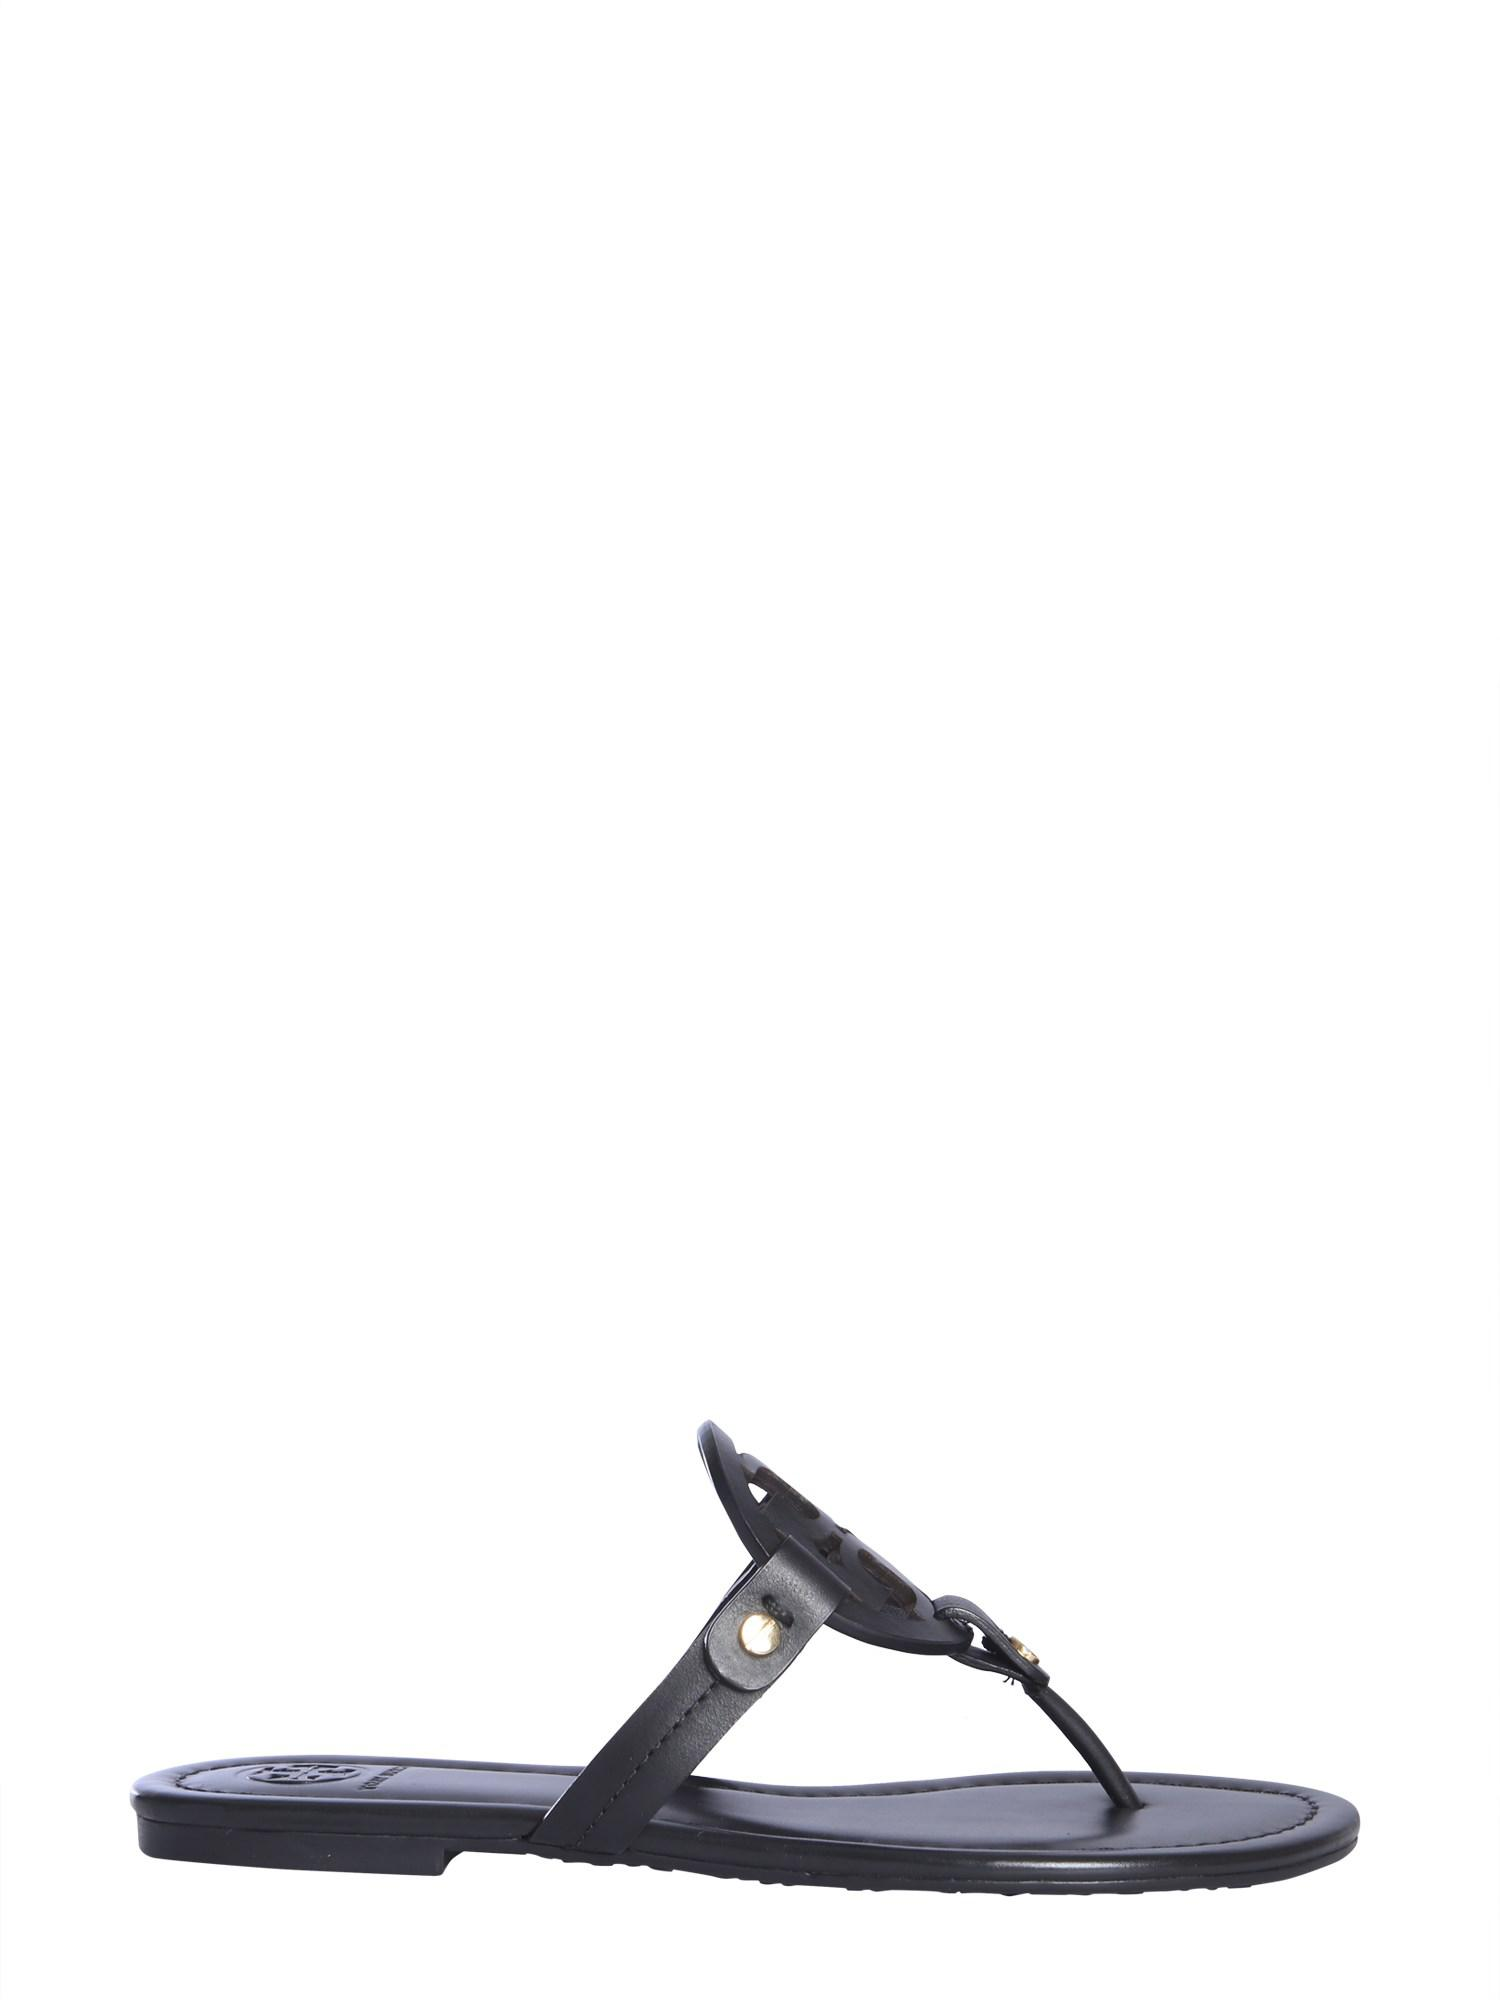 566def19b792b Lyst - Tory Burch Miller Infradito In Pelle in Black